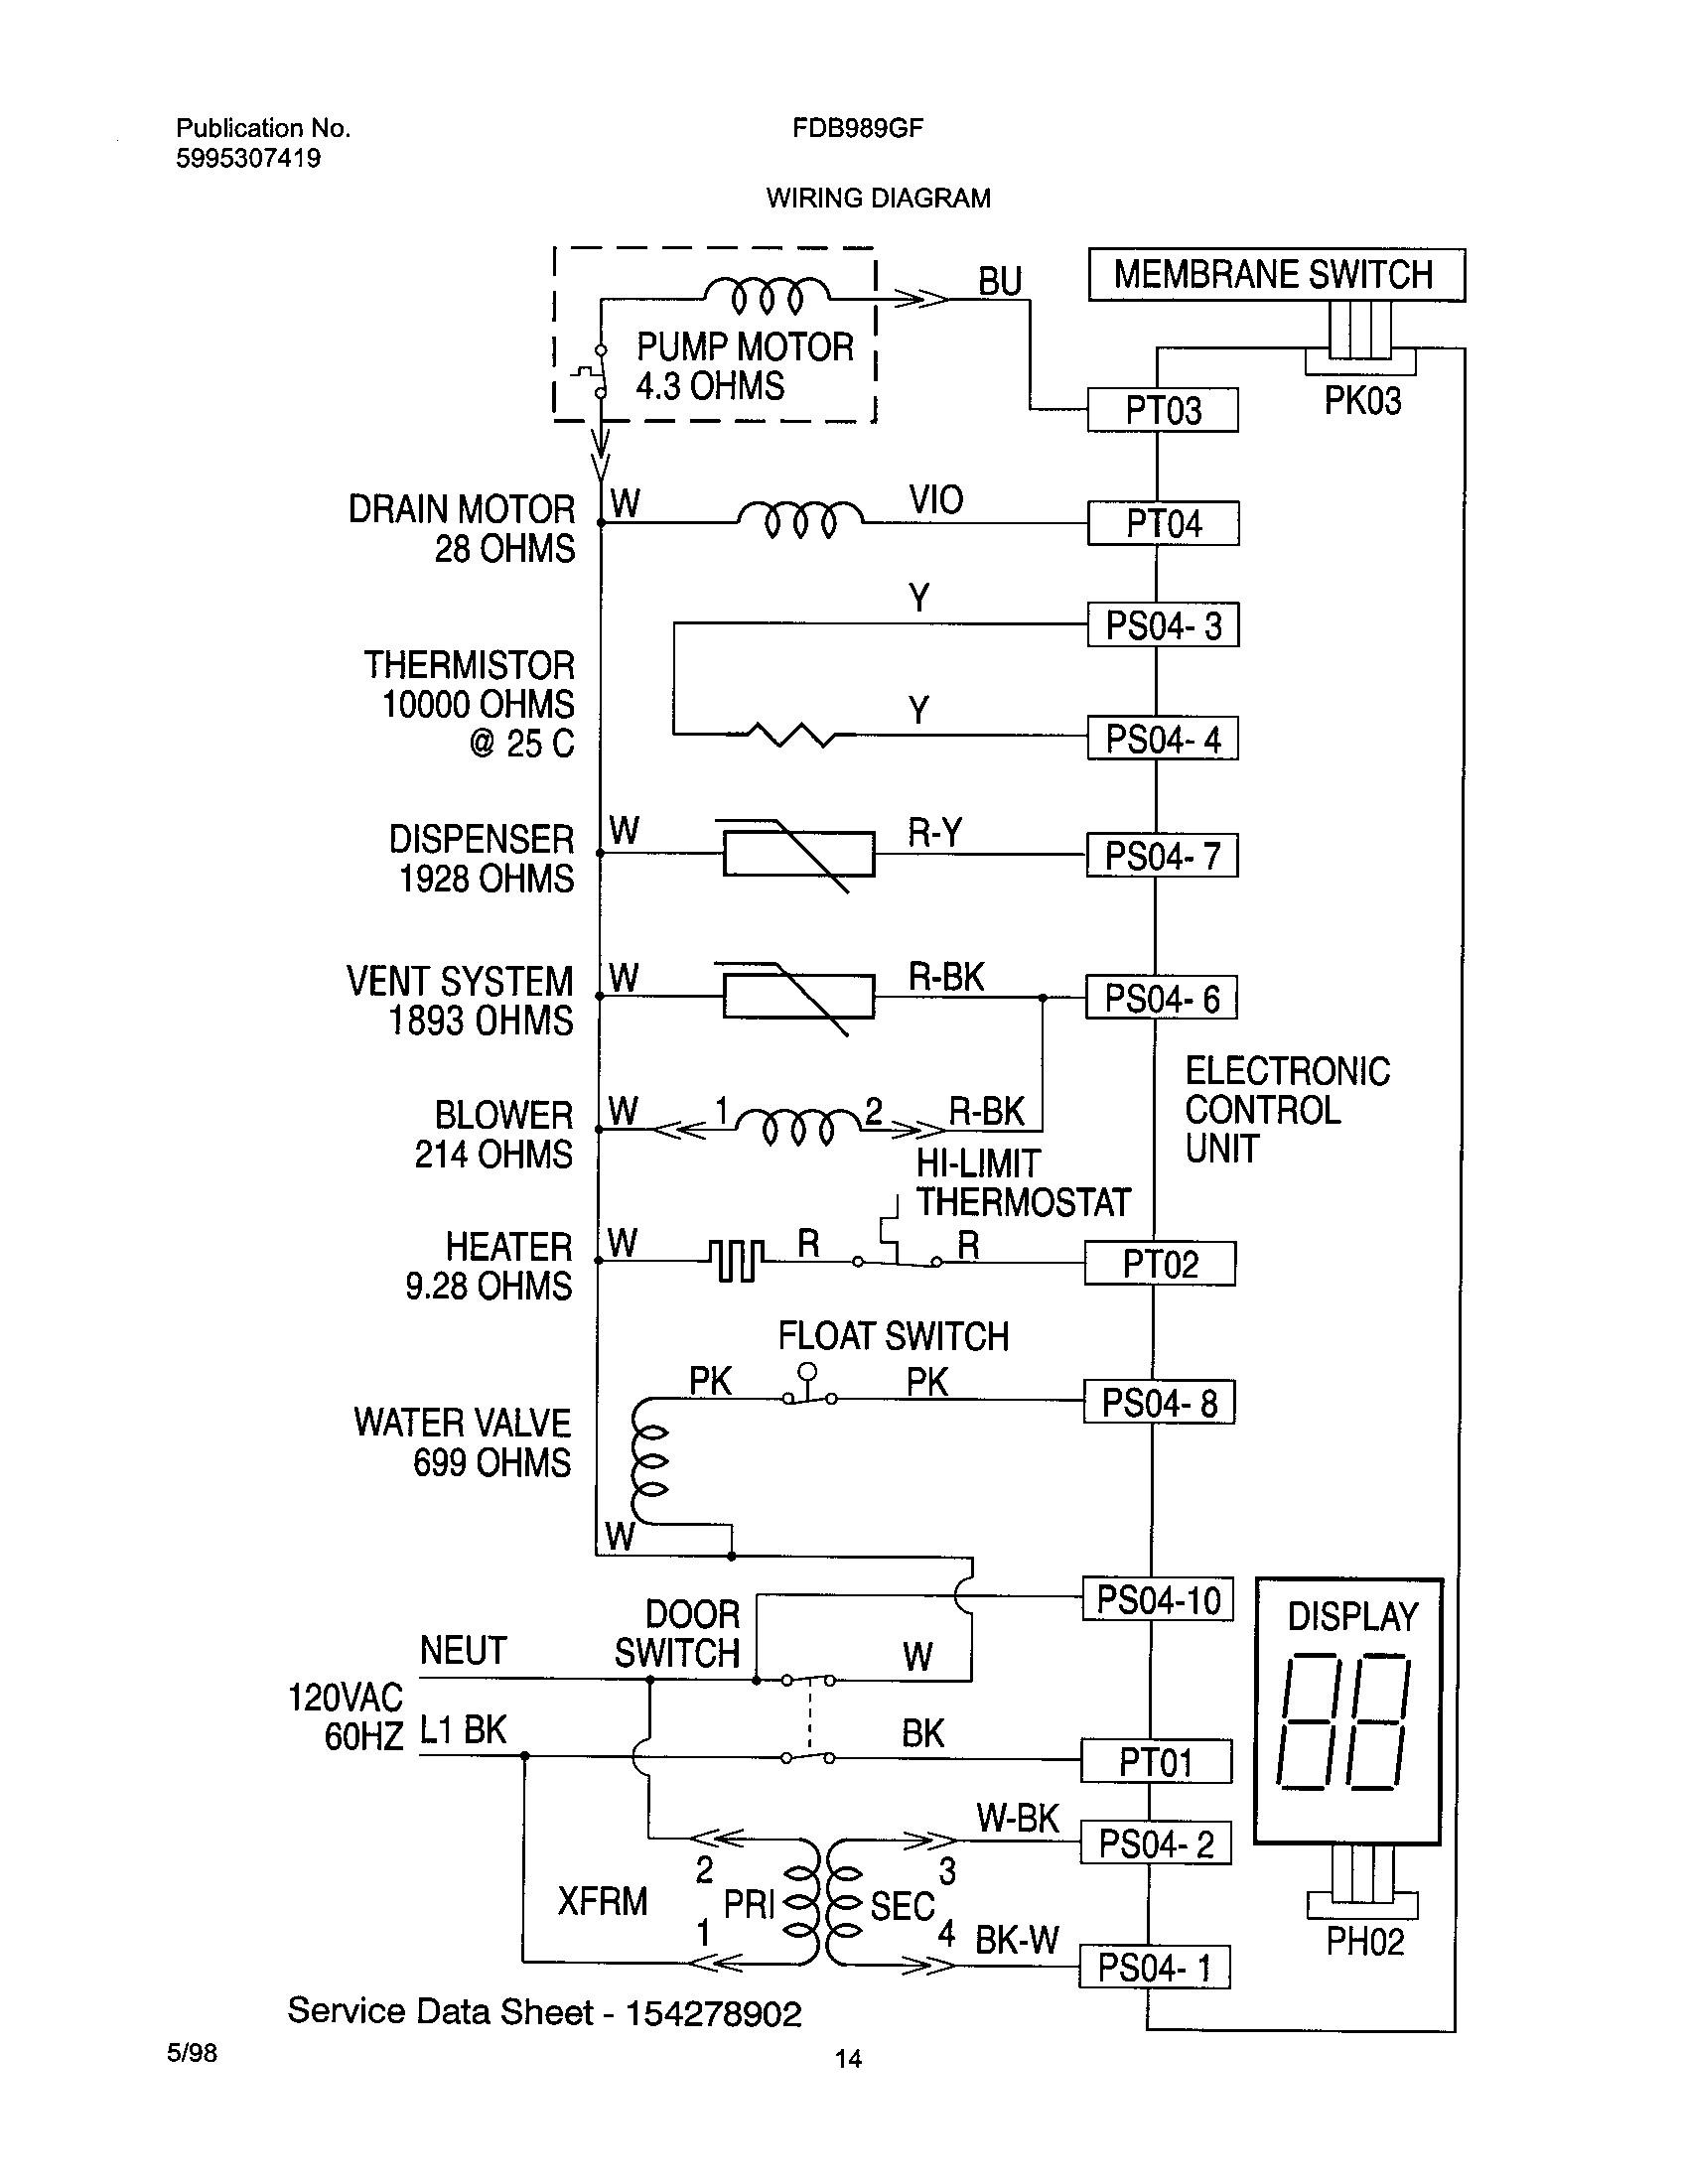 frigidaire fefbc68cba electric range wiring diagram house wiring rh maxturner co GE Stove Wiring-Diagram Electric Range Wiring Diagram